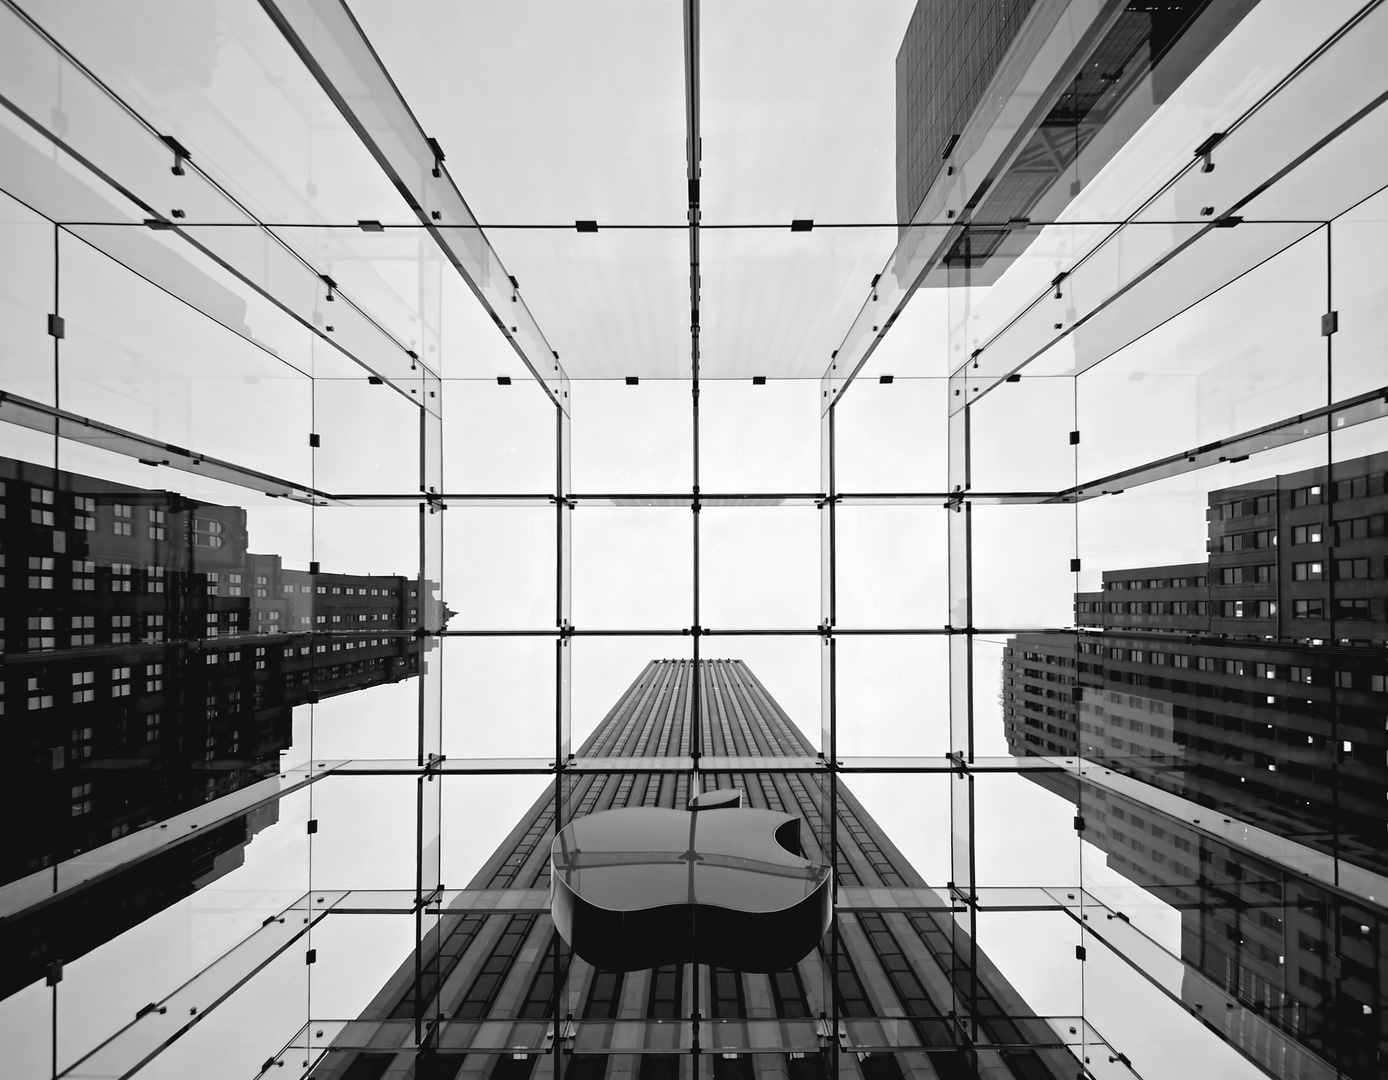 new.york.city.04